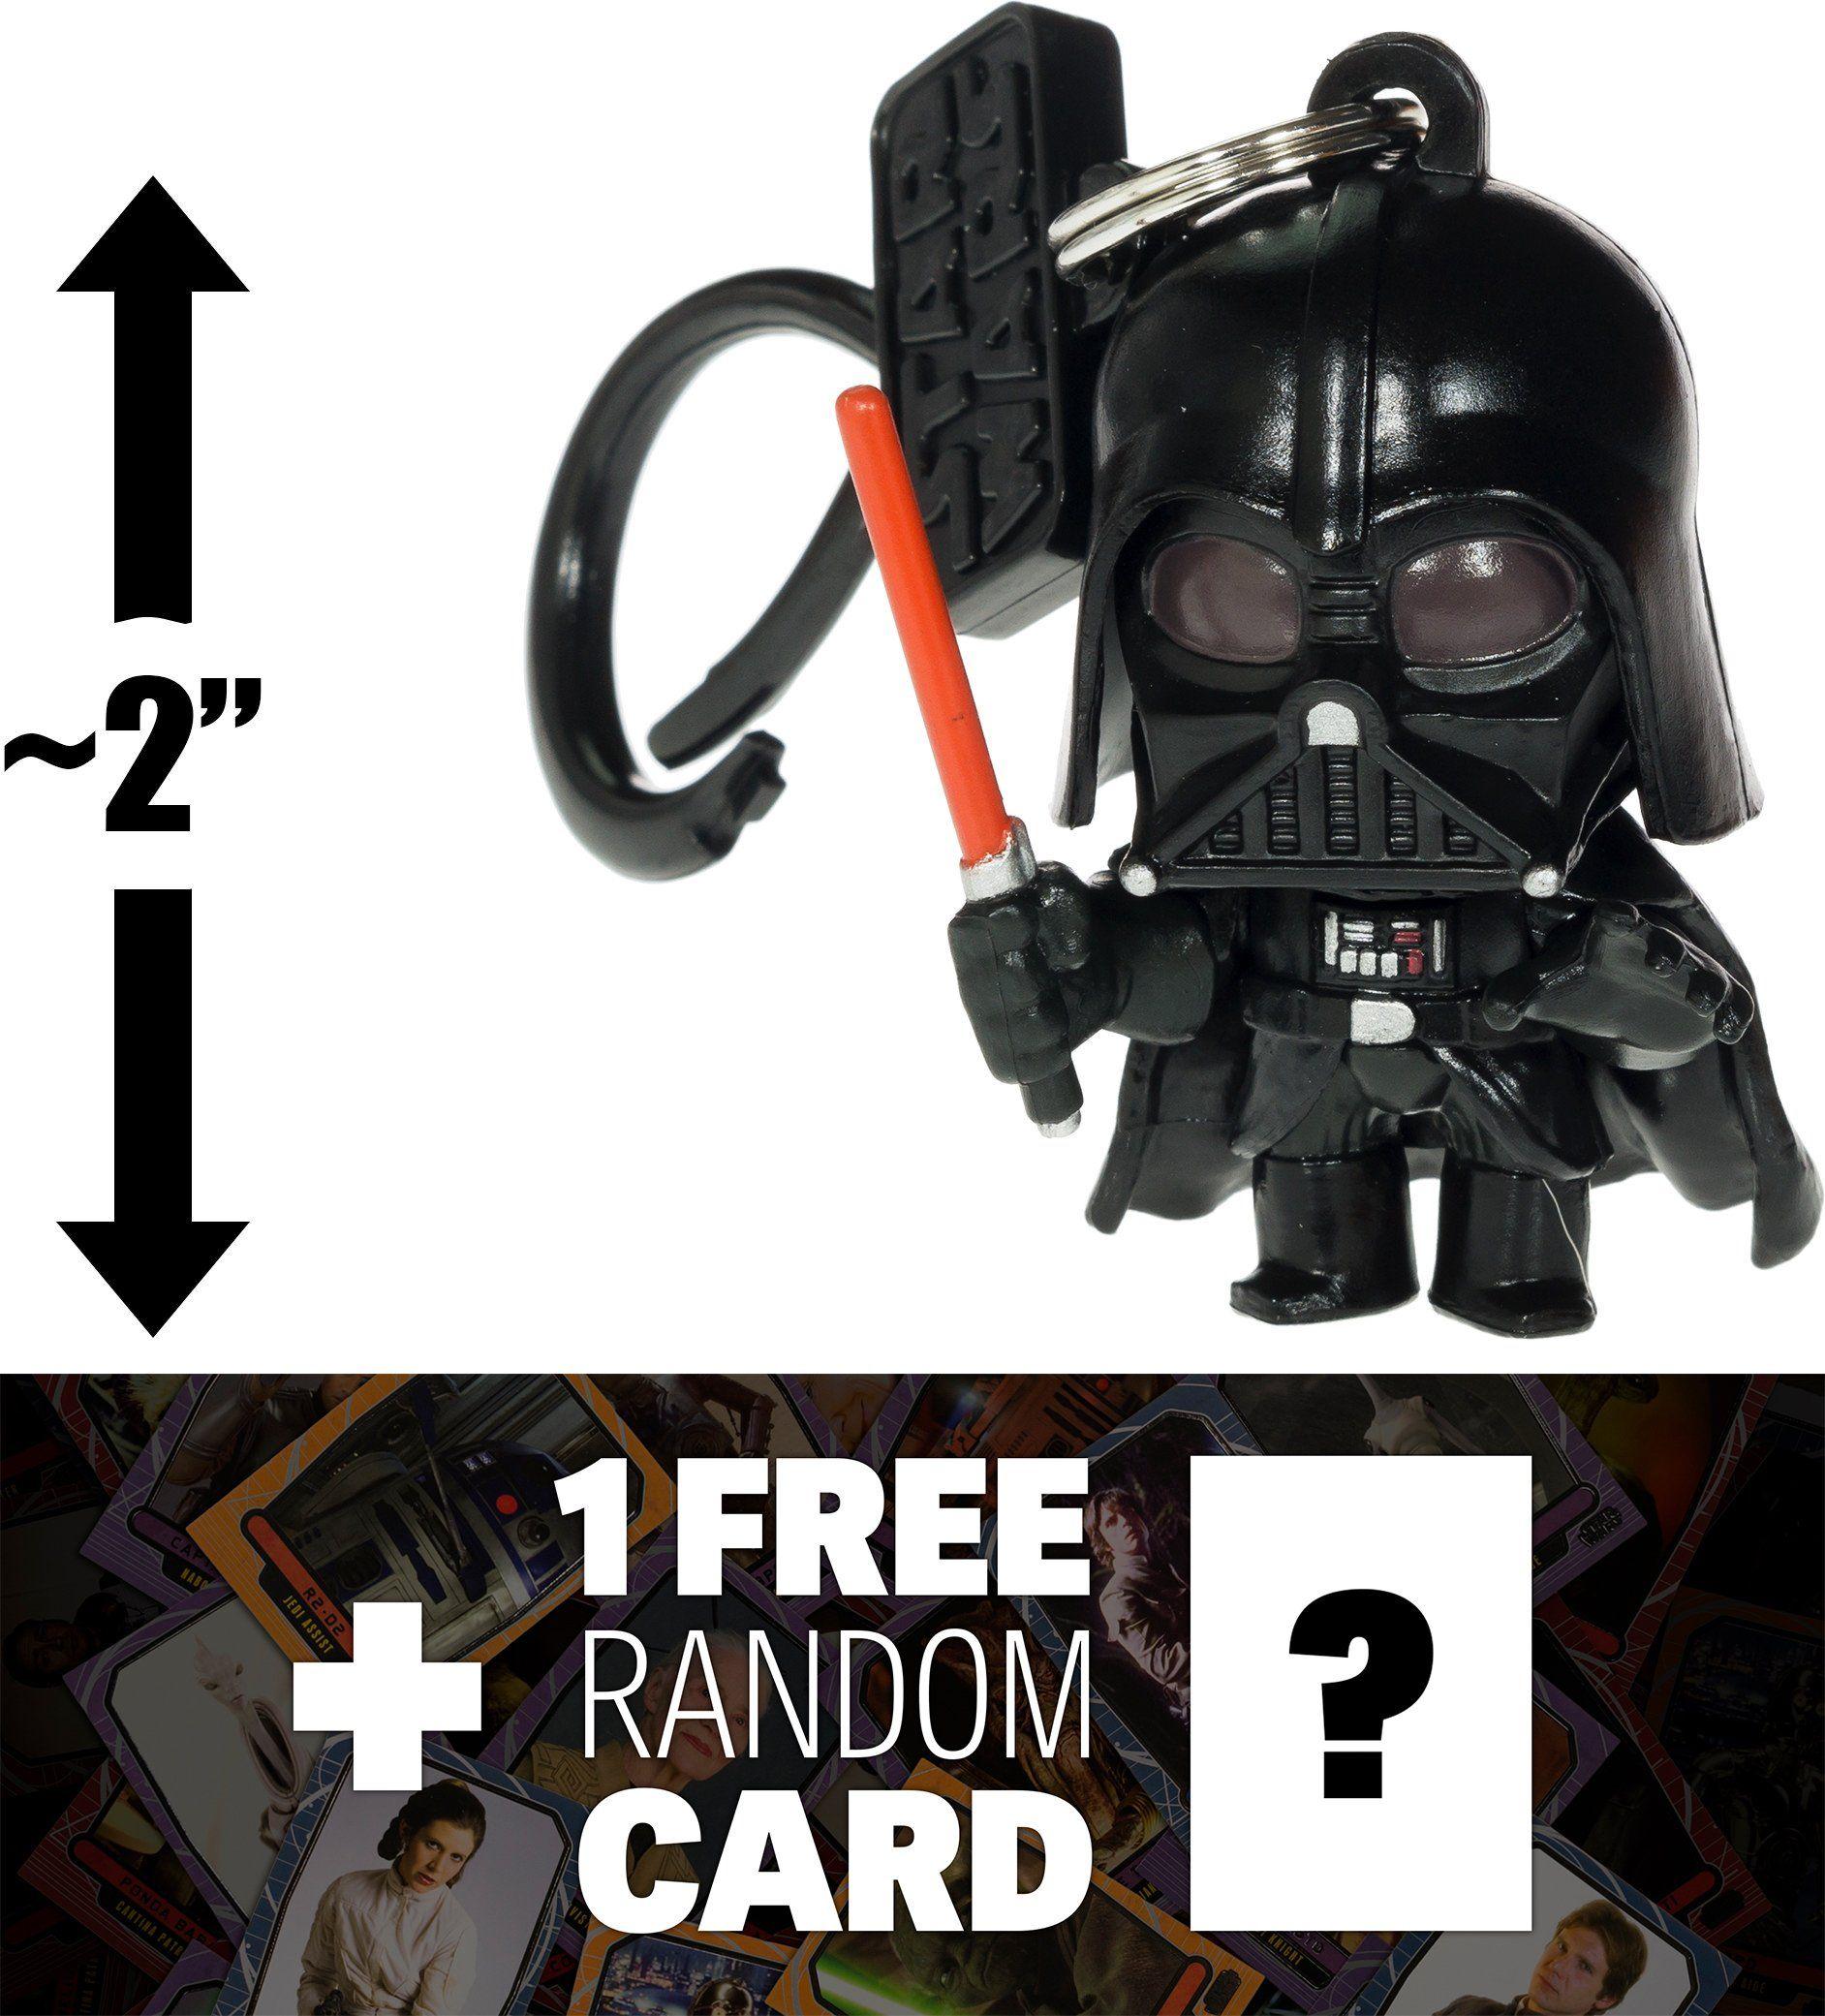 Darth Vader: ~2 Star Wars MiniFigural Bag Clip 1 FREE